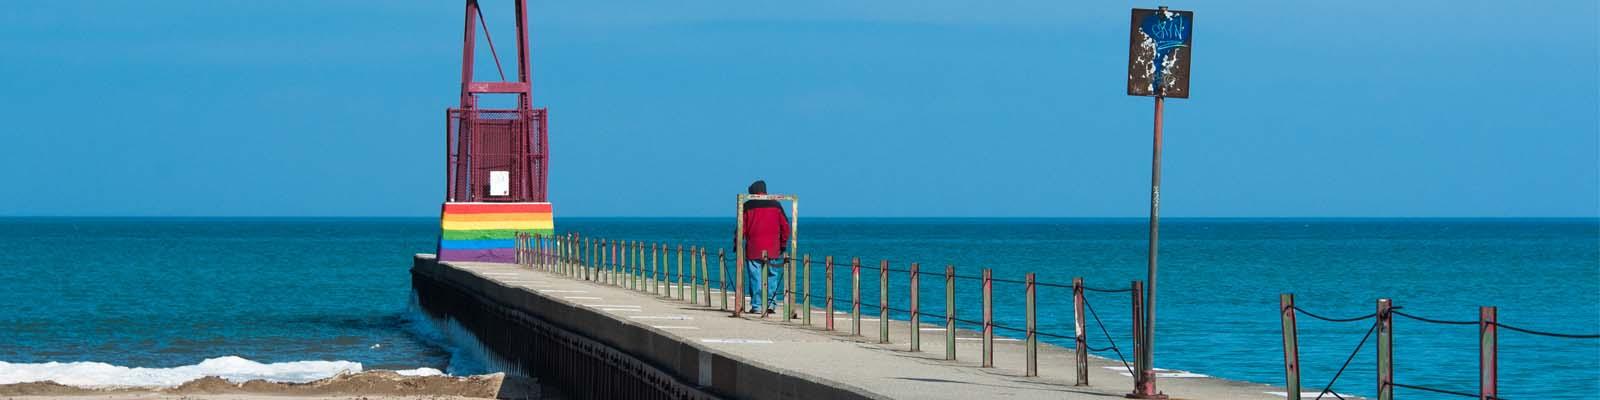 Pictured: An ocean pier in Michigan.